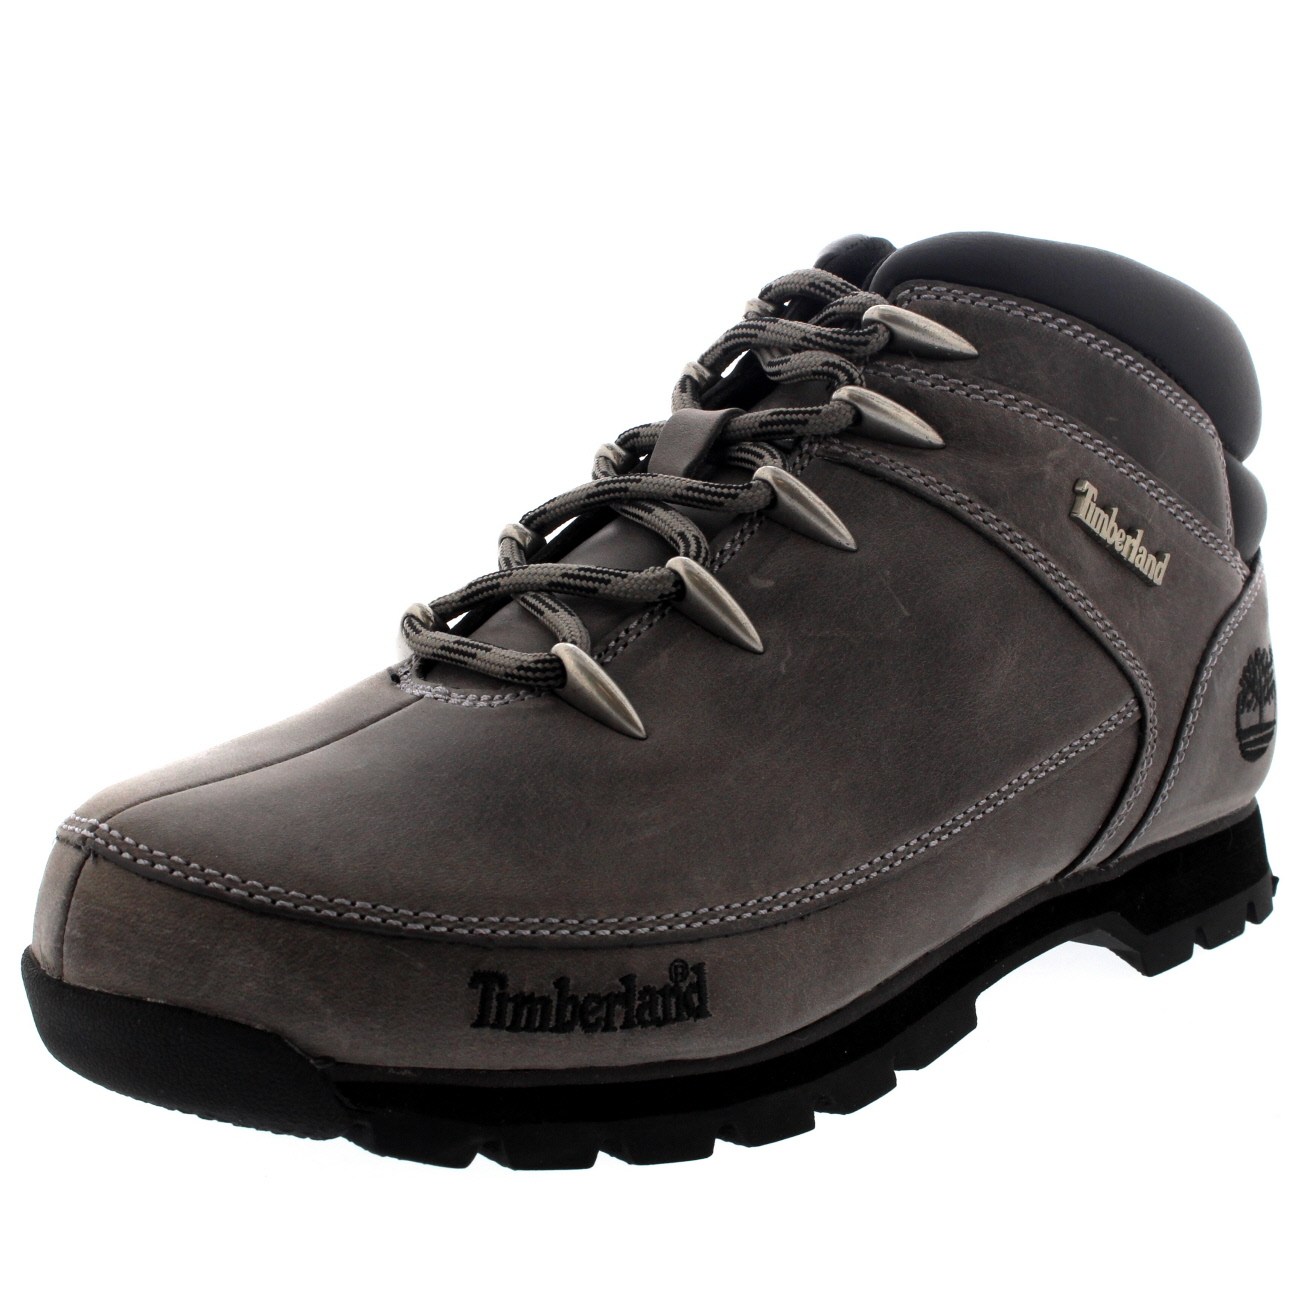 timberland sprint hiker